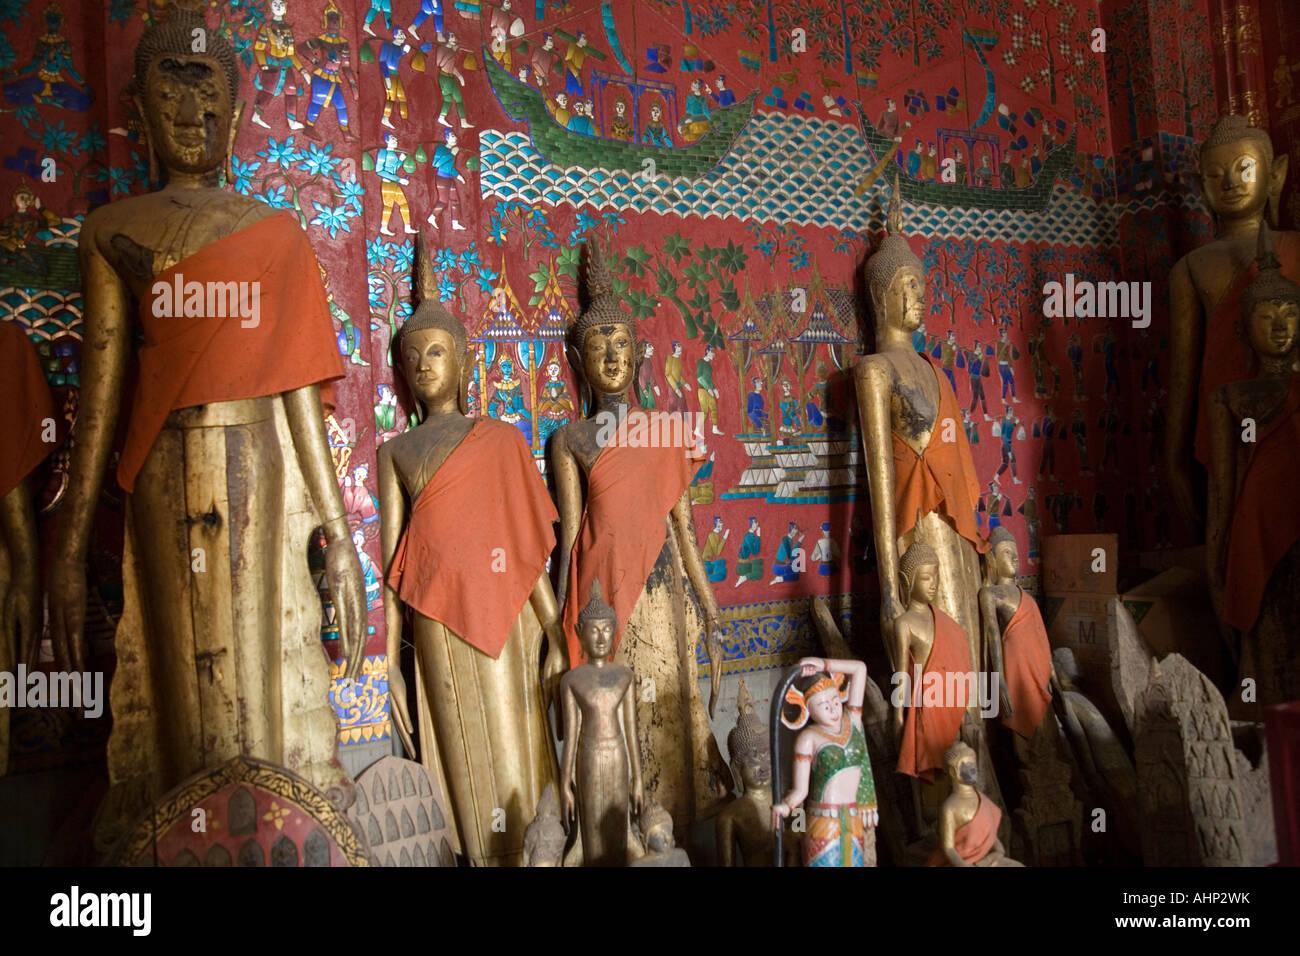 Almacenan estatuas de Buda en la casa funeraria de Xieng Thong Templo en Luang Prabang, Laos, donde se mantiene Foto de stock